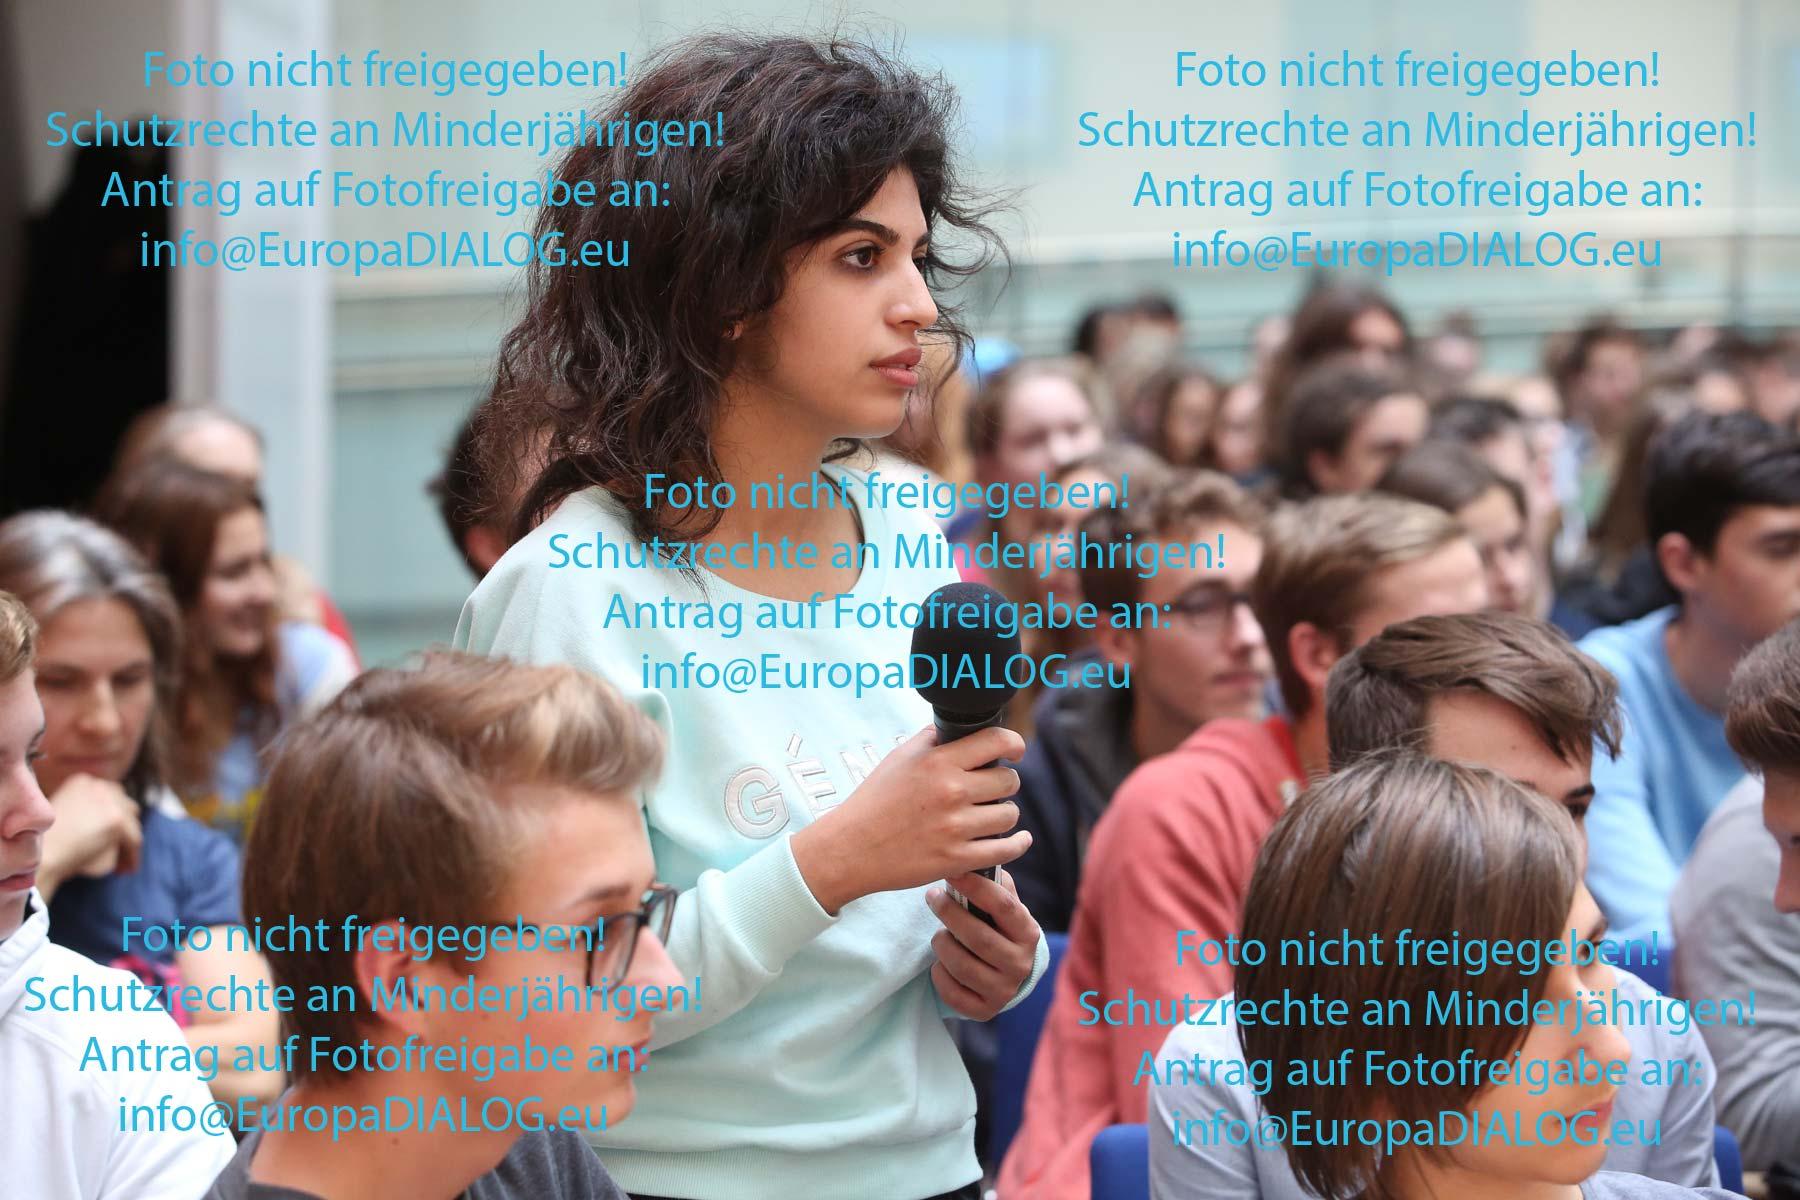 europadialog_bettina-prendergast_s_b14__401788_-katharina-schiffl__